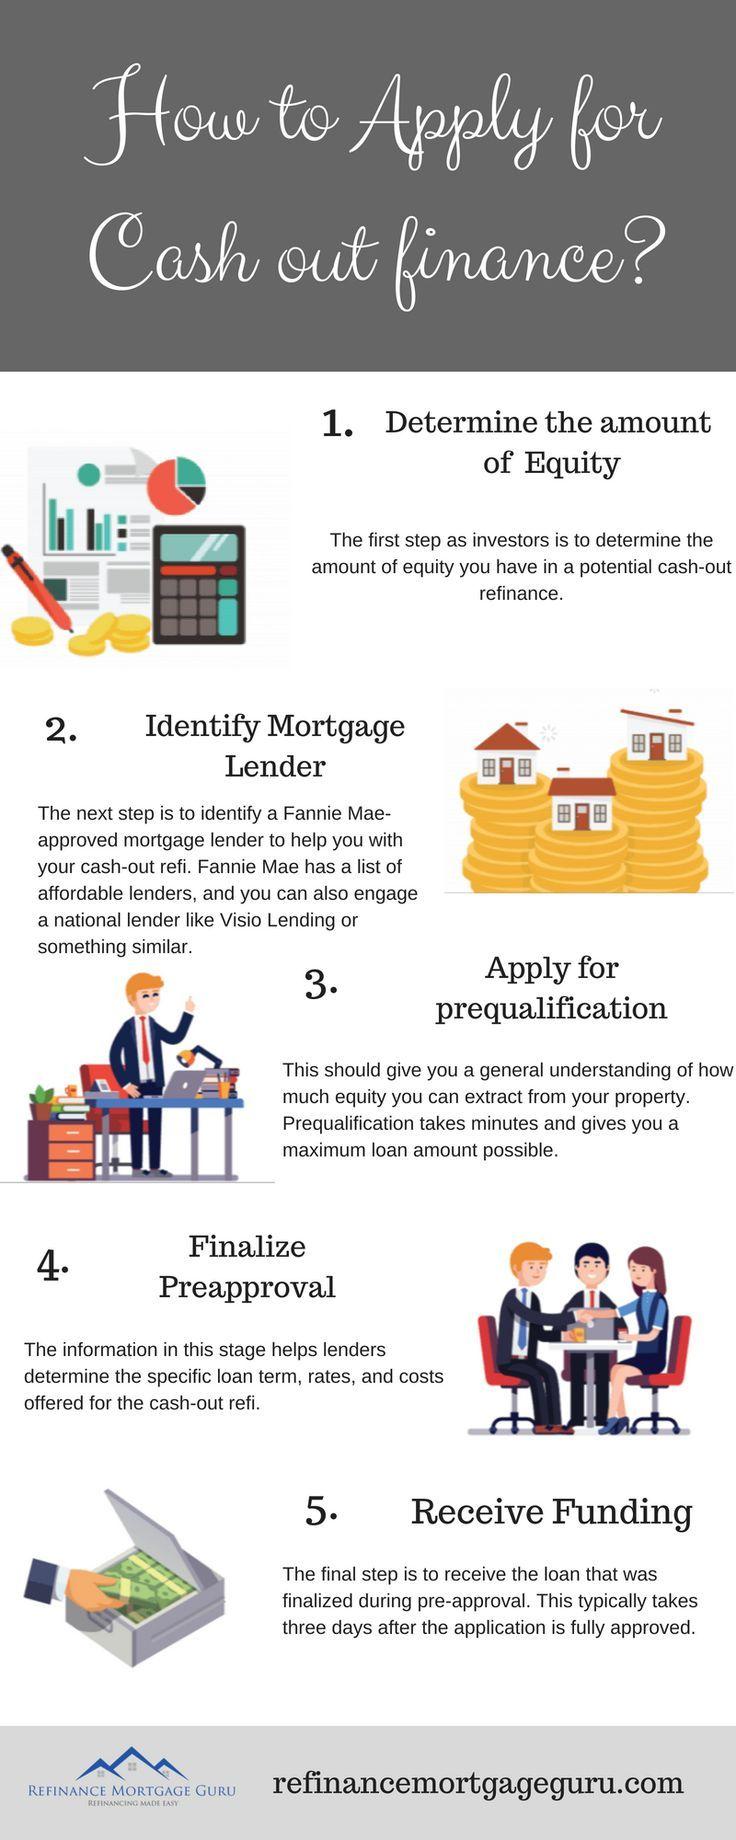 Advantages Of Cash Out Refinance Refinance Mortgage Guru